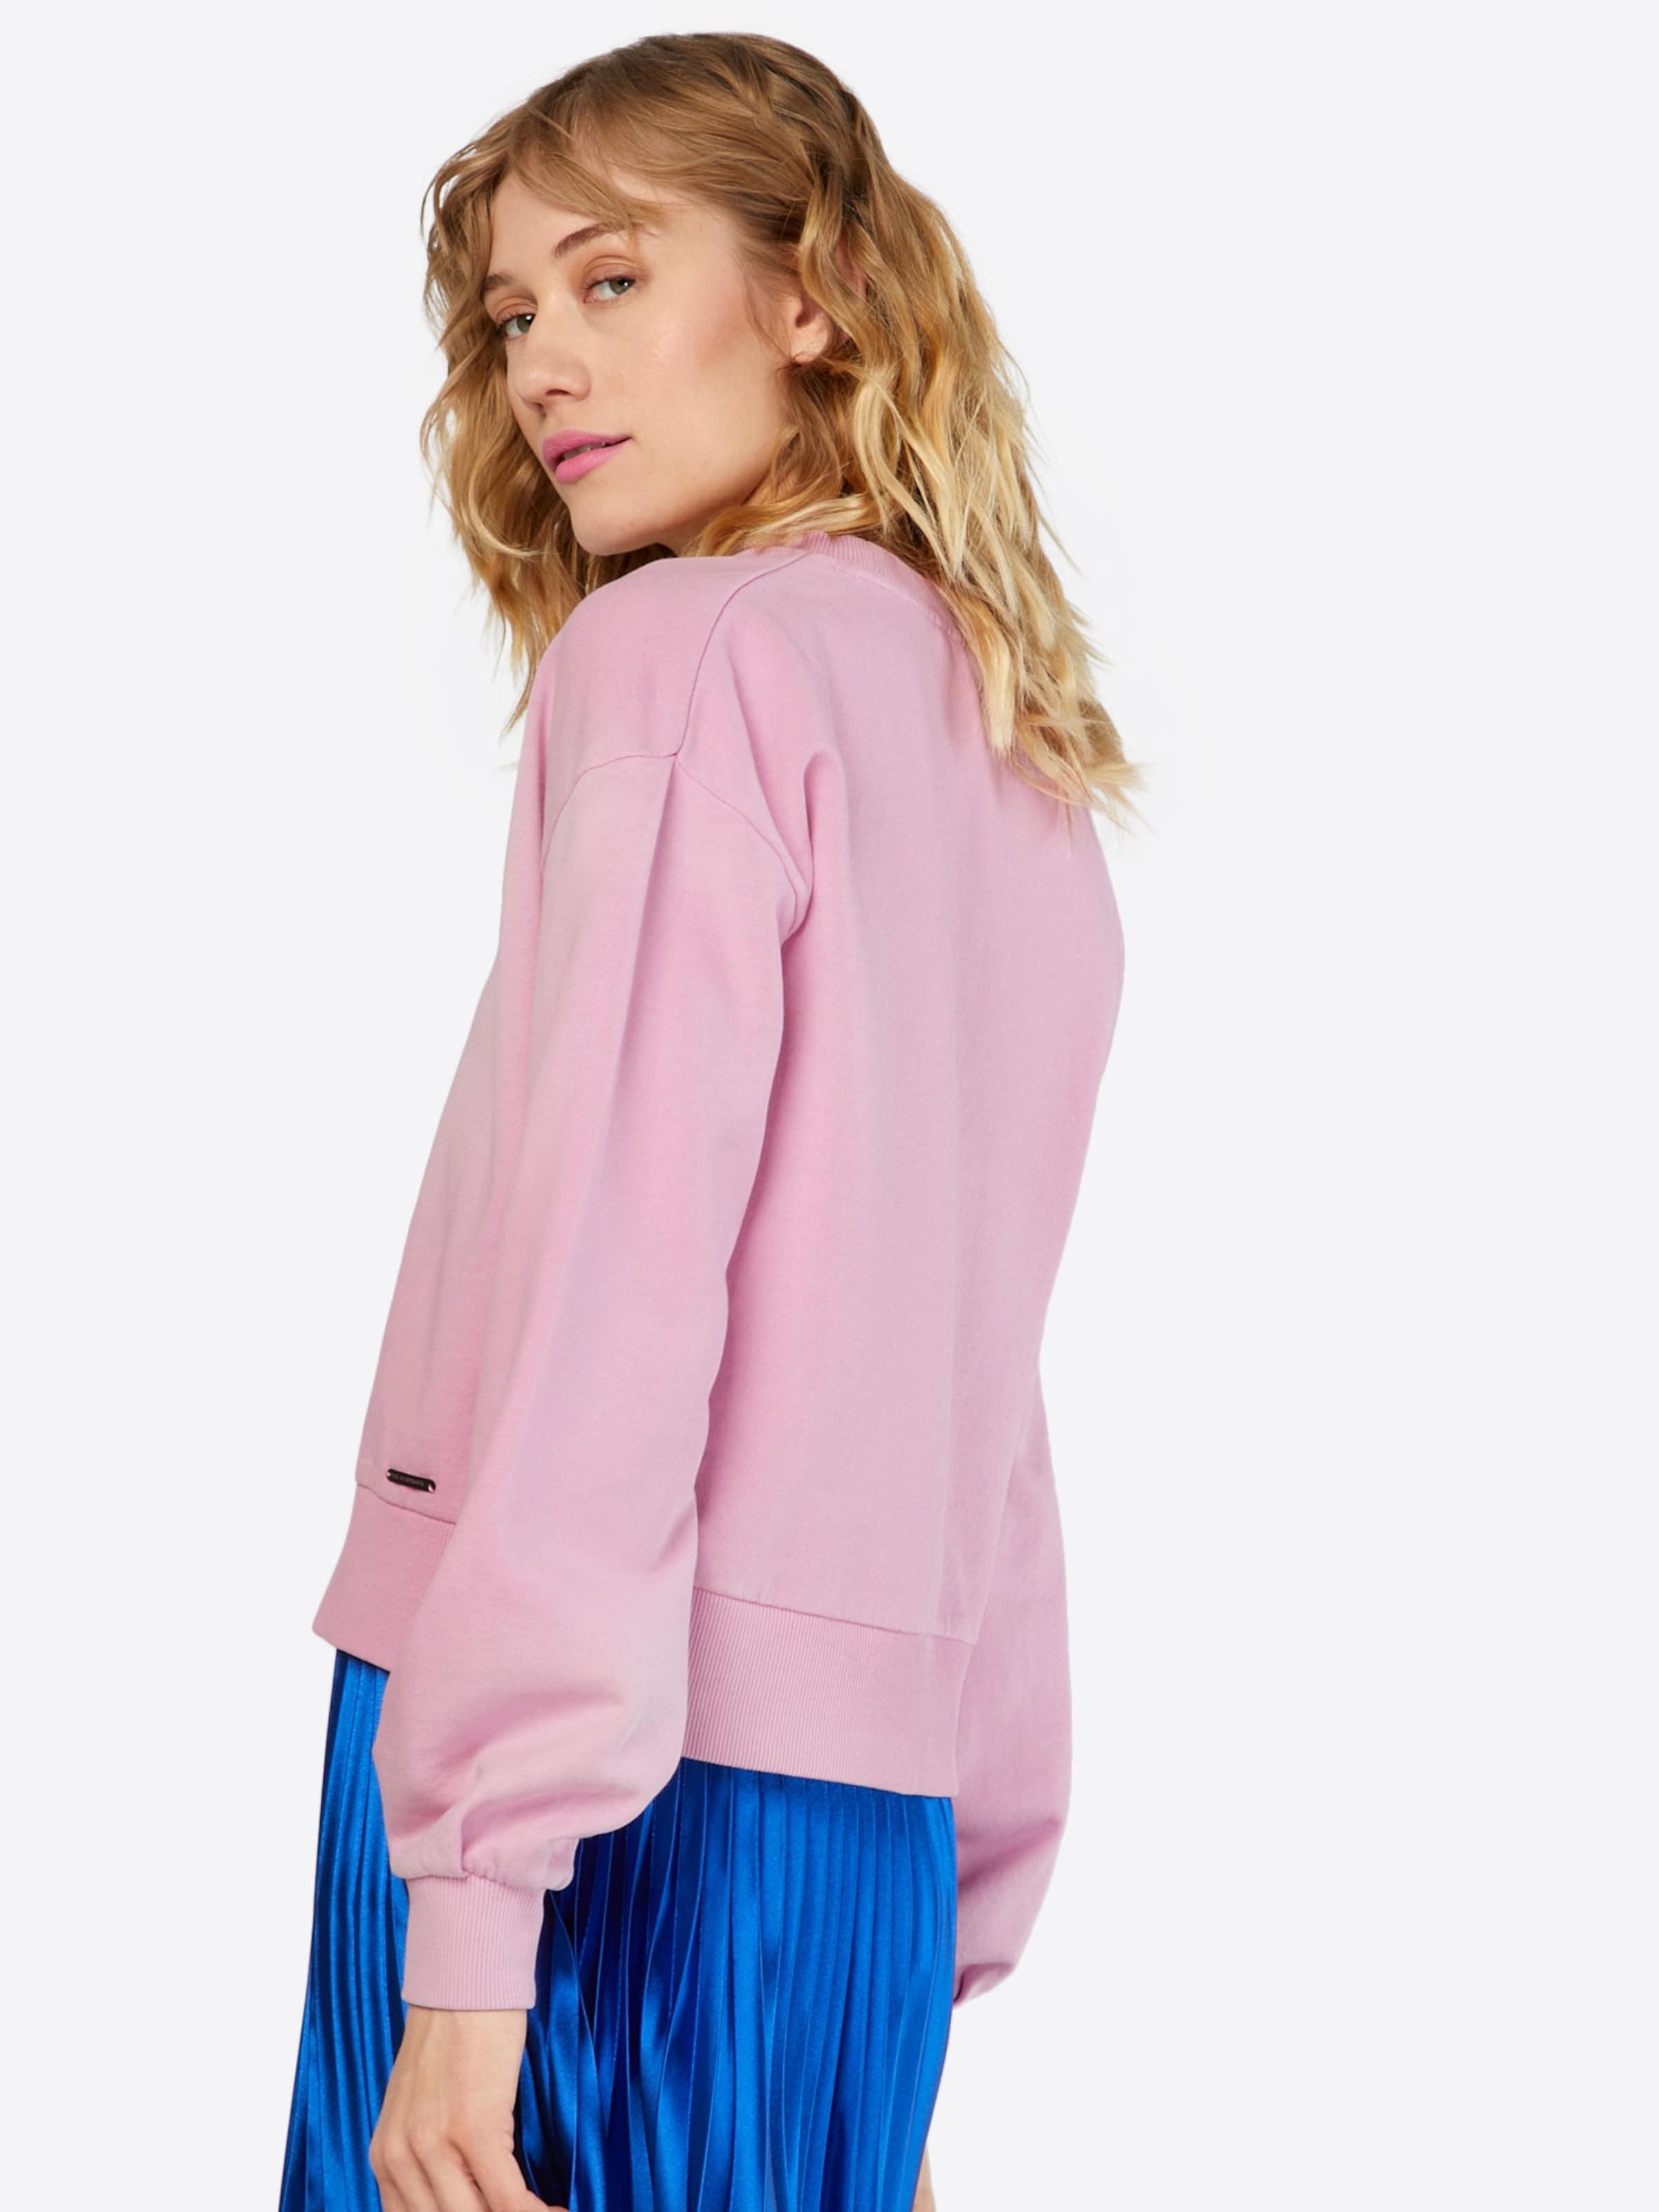 Nümph Sweatshirt Sweatshirt 'benjamina' In Nümph Nümph Pink 'benjamina' In Pink orxdeCBW